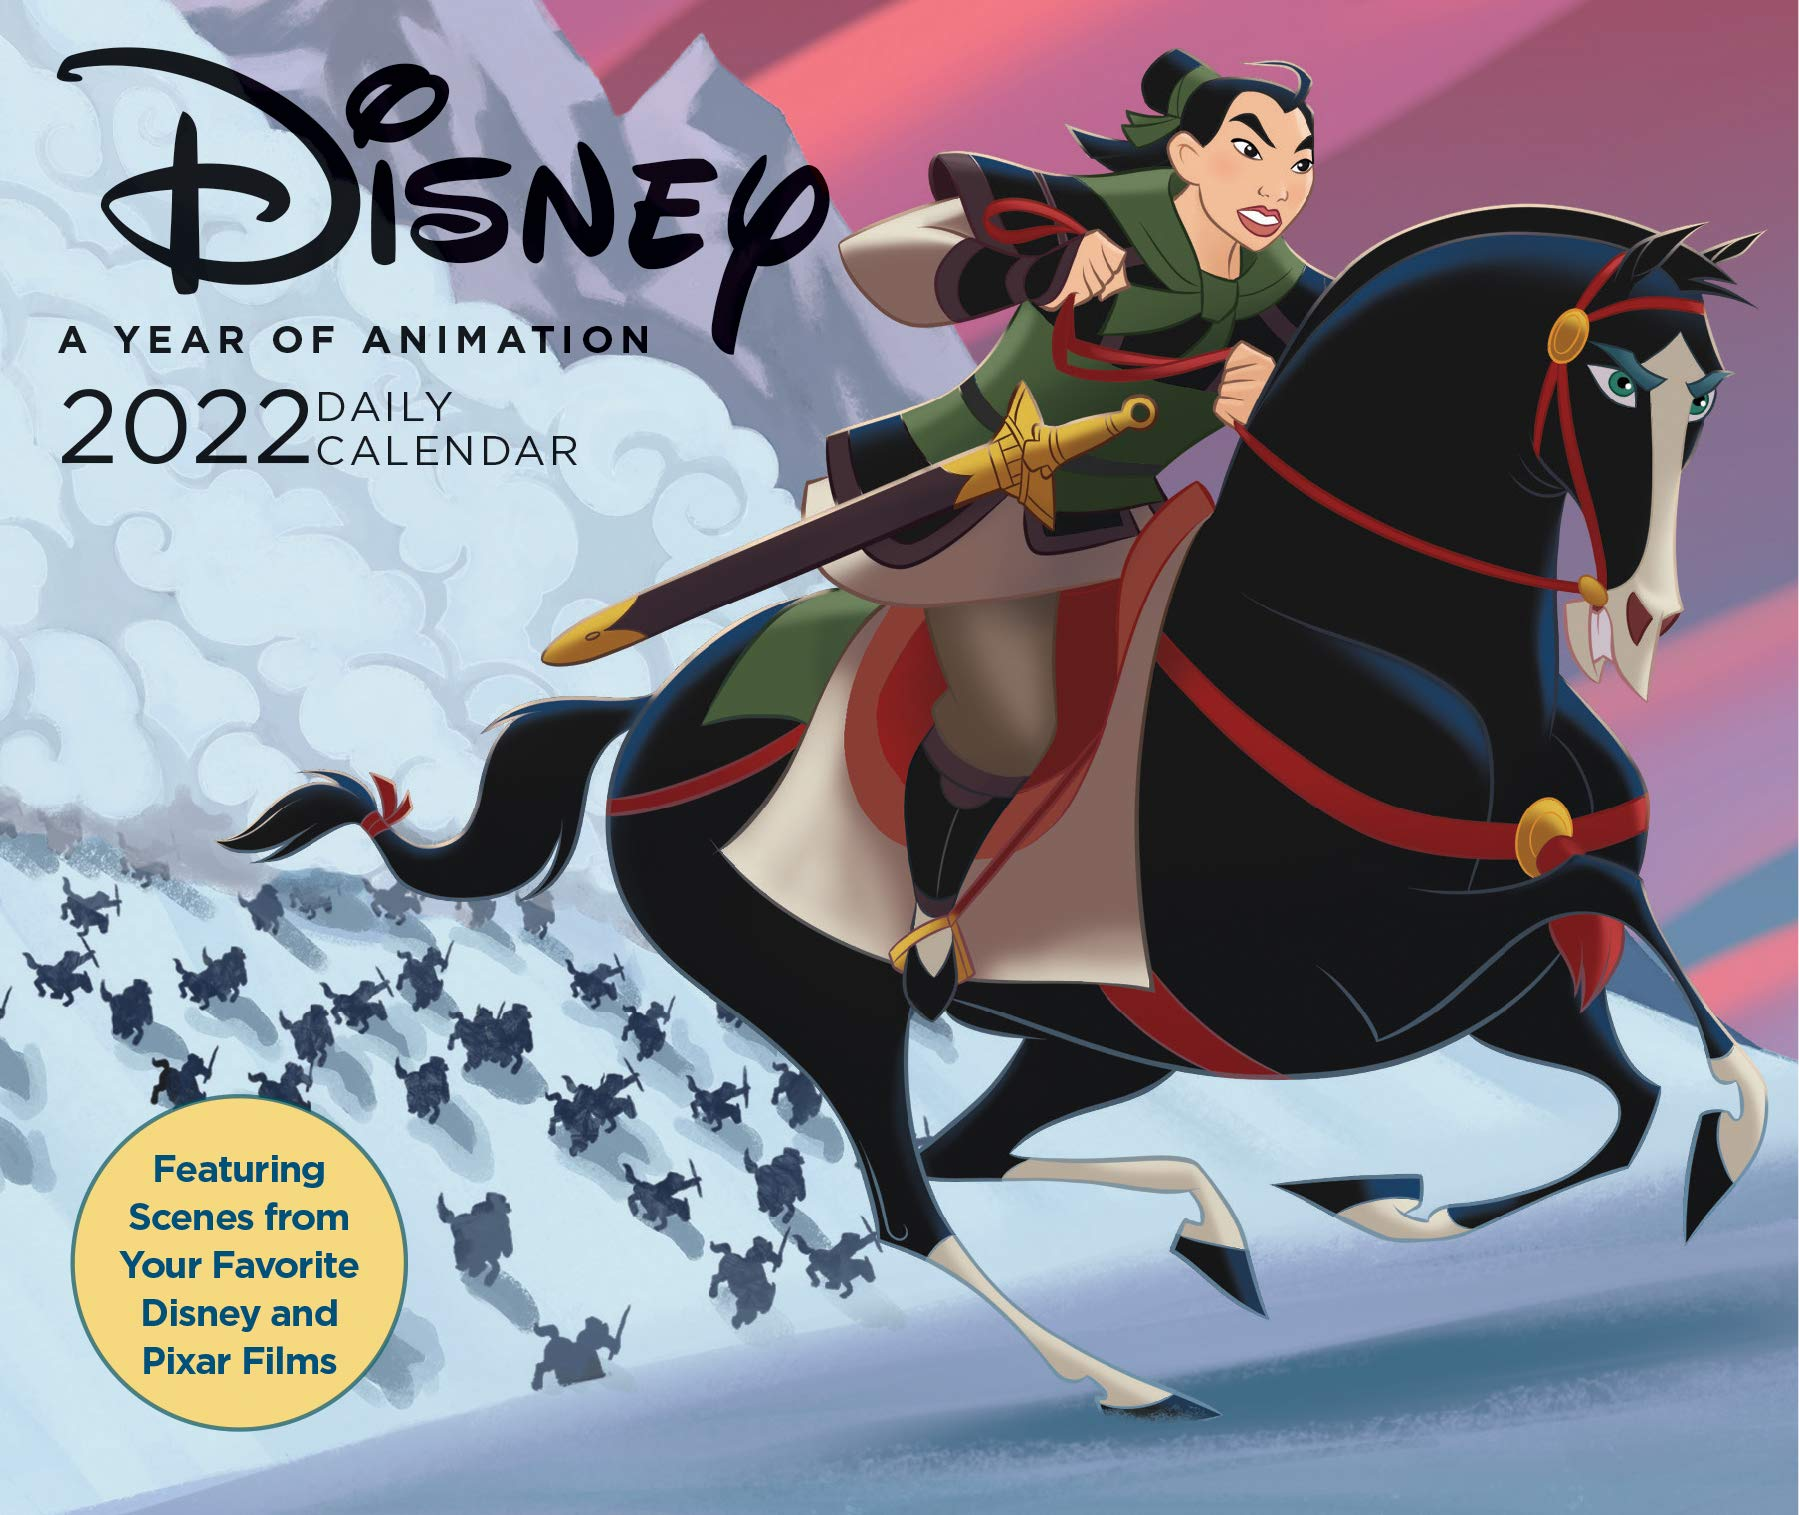 Calendrier 2022 Disney Disney 2022 Daily Cal: Wilson, Chuck: 9781797200910: Amazon.com: Books